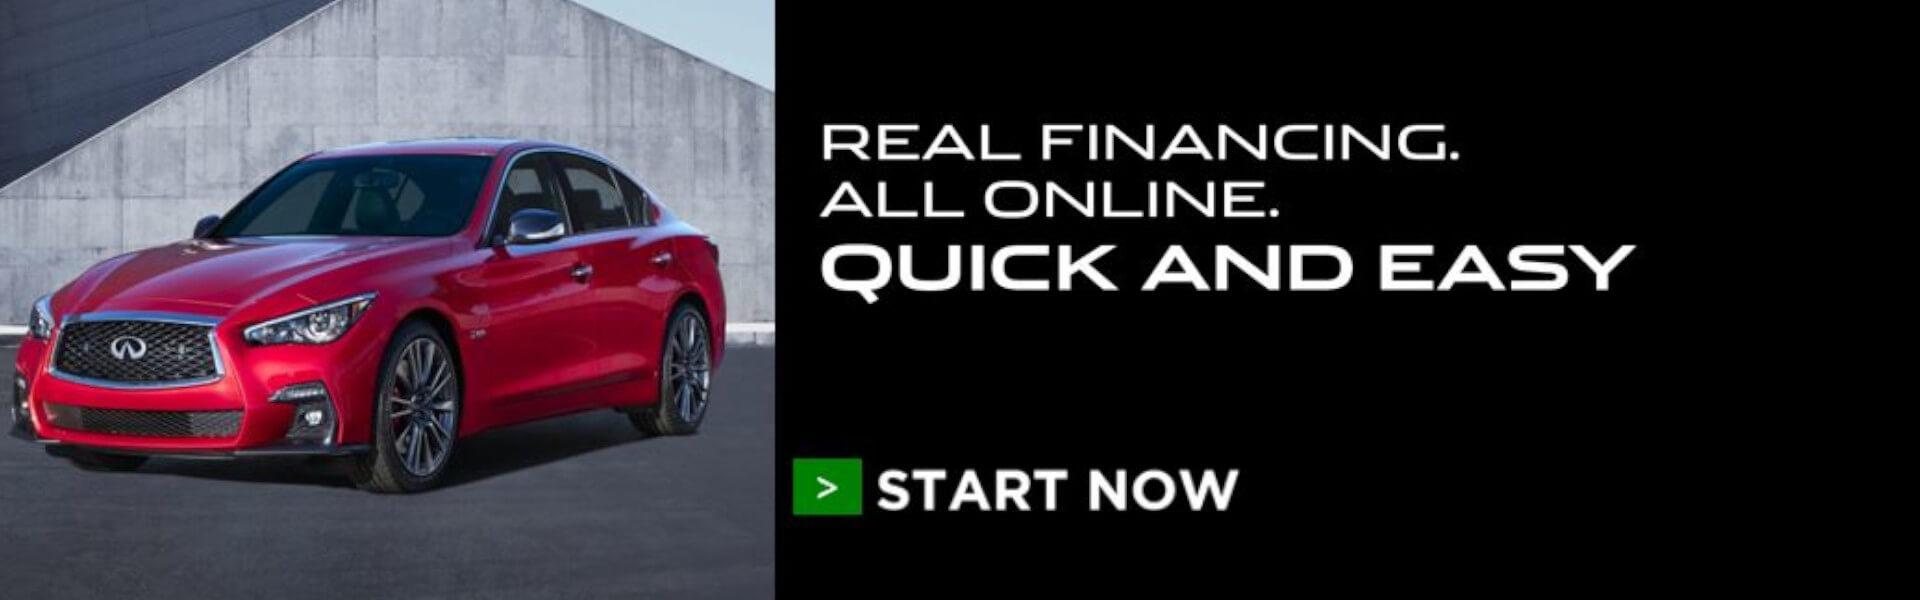 INFINITI Finance - webbuy